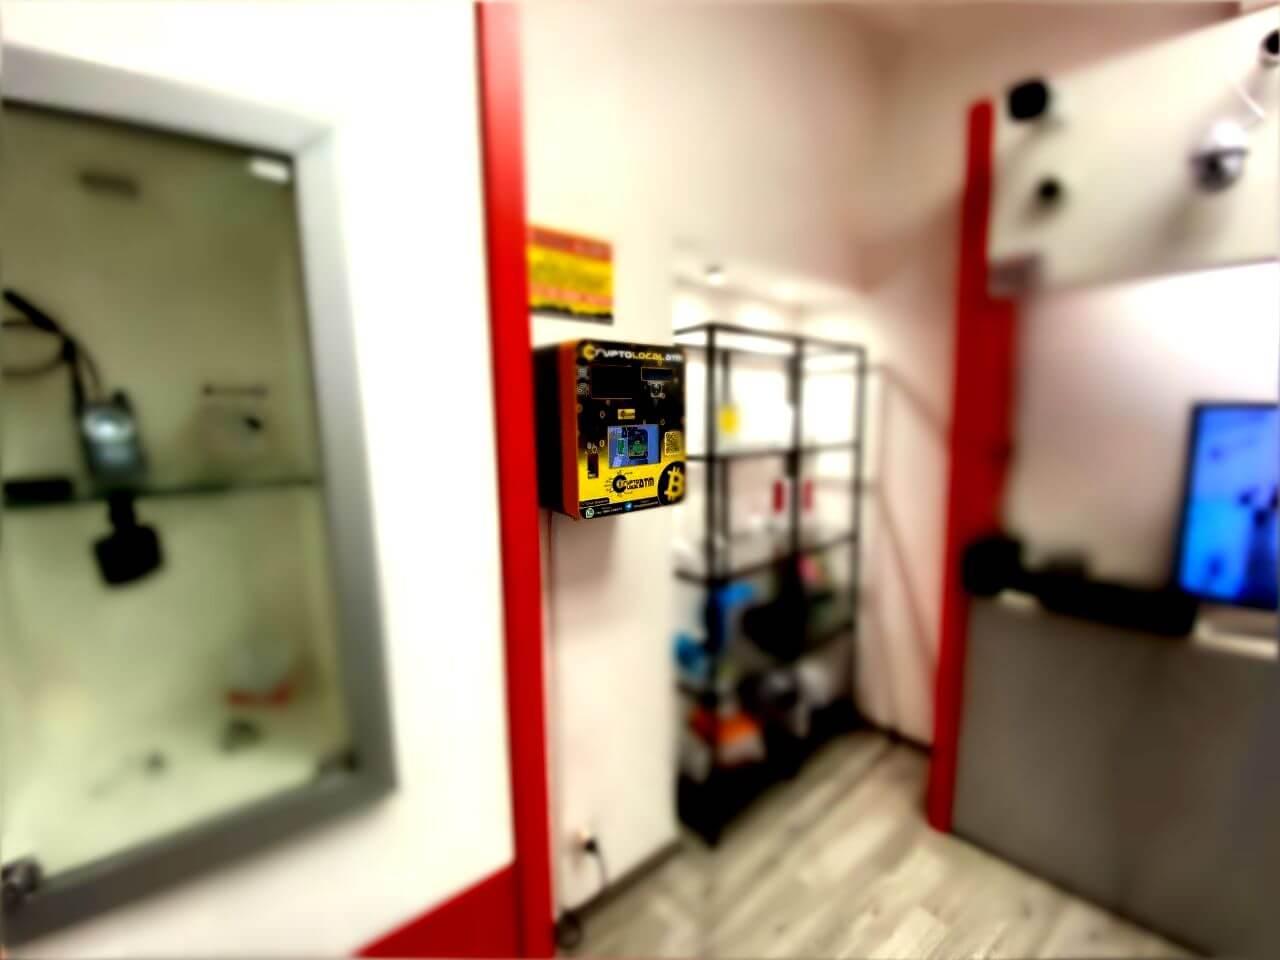 Bitcoin ATM Catania - CryptoLocalATM